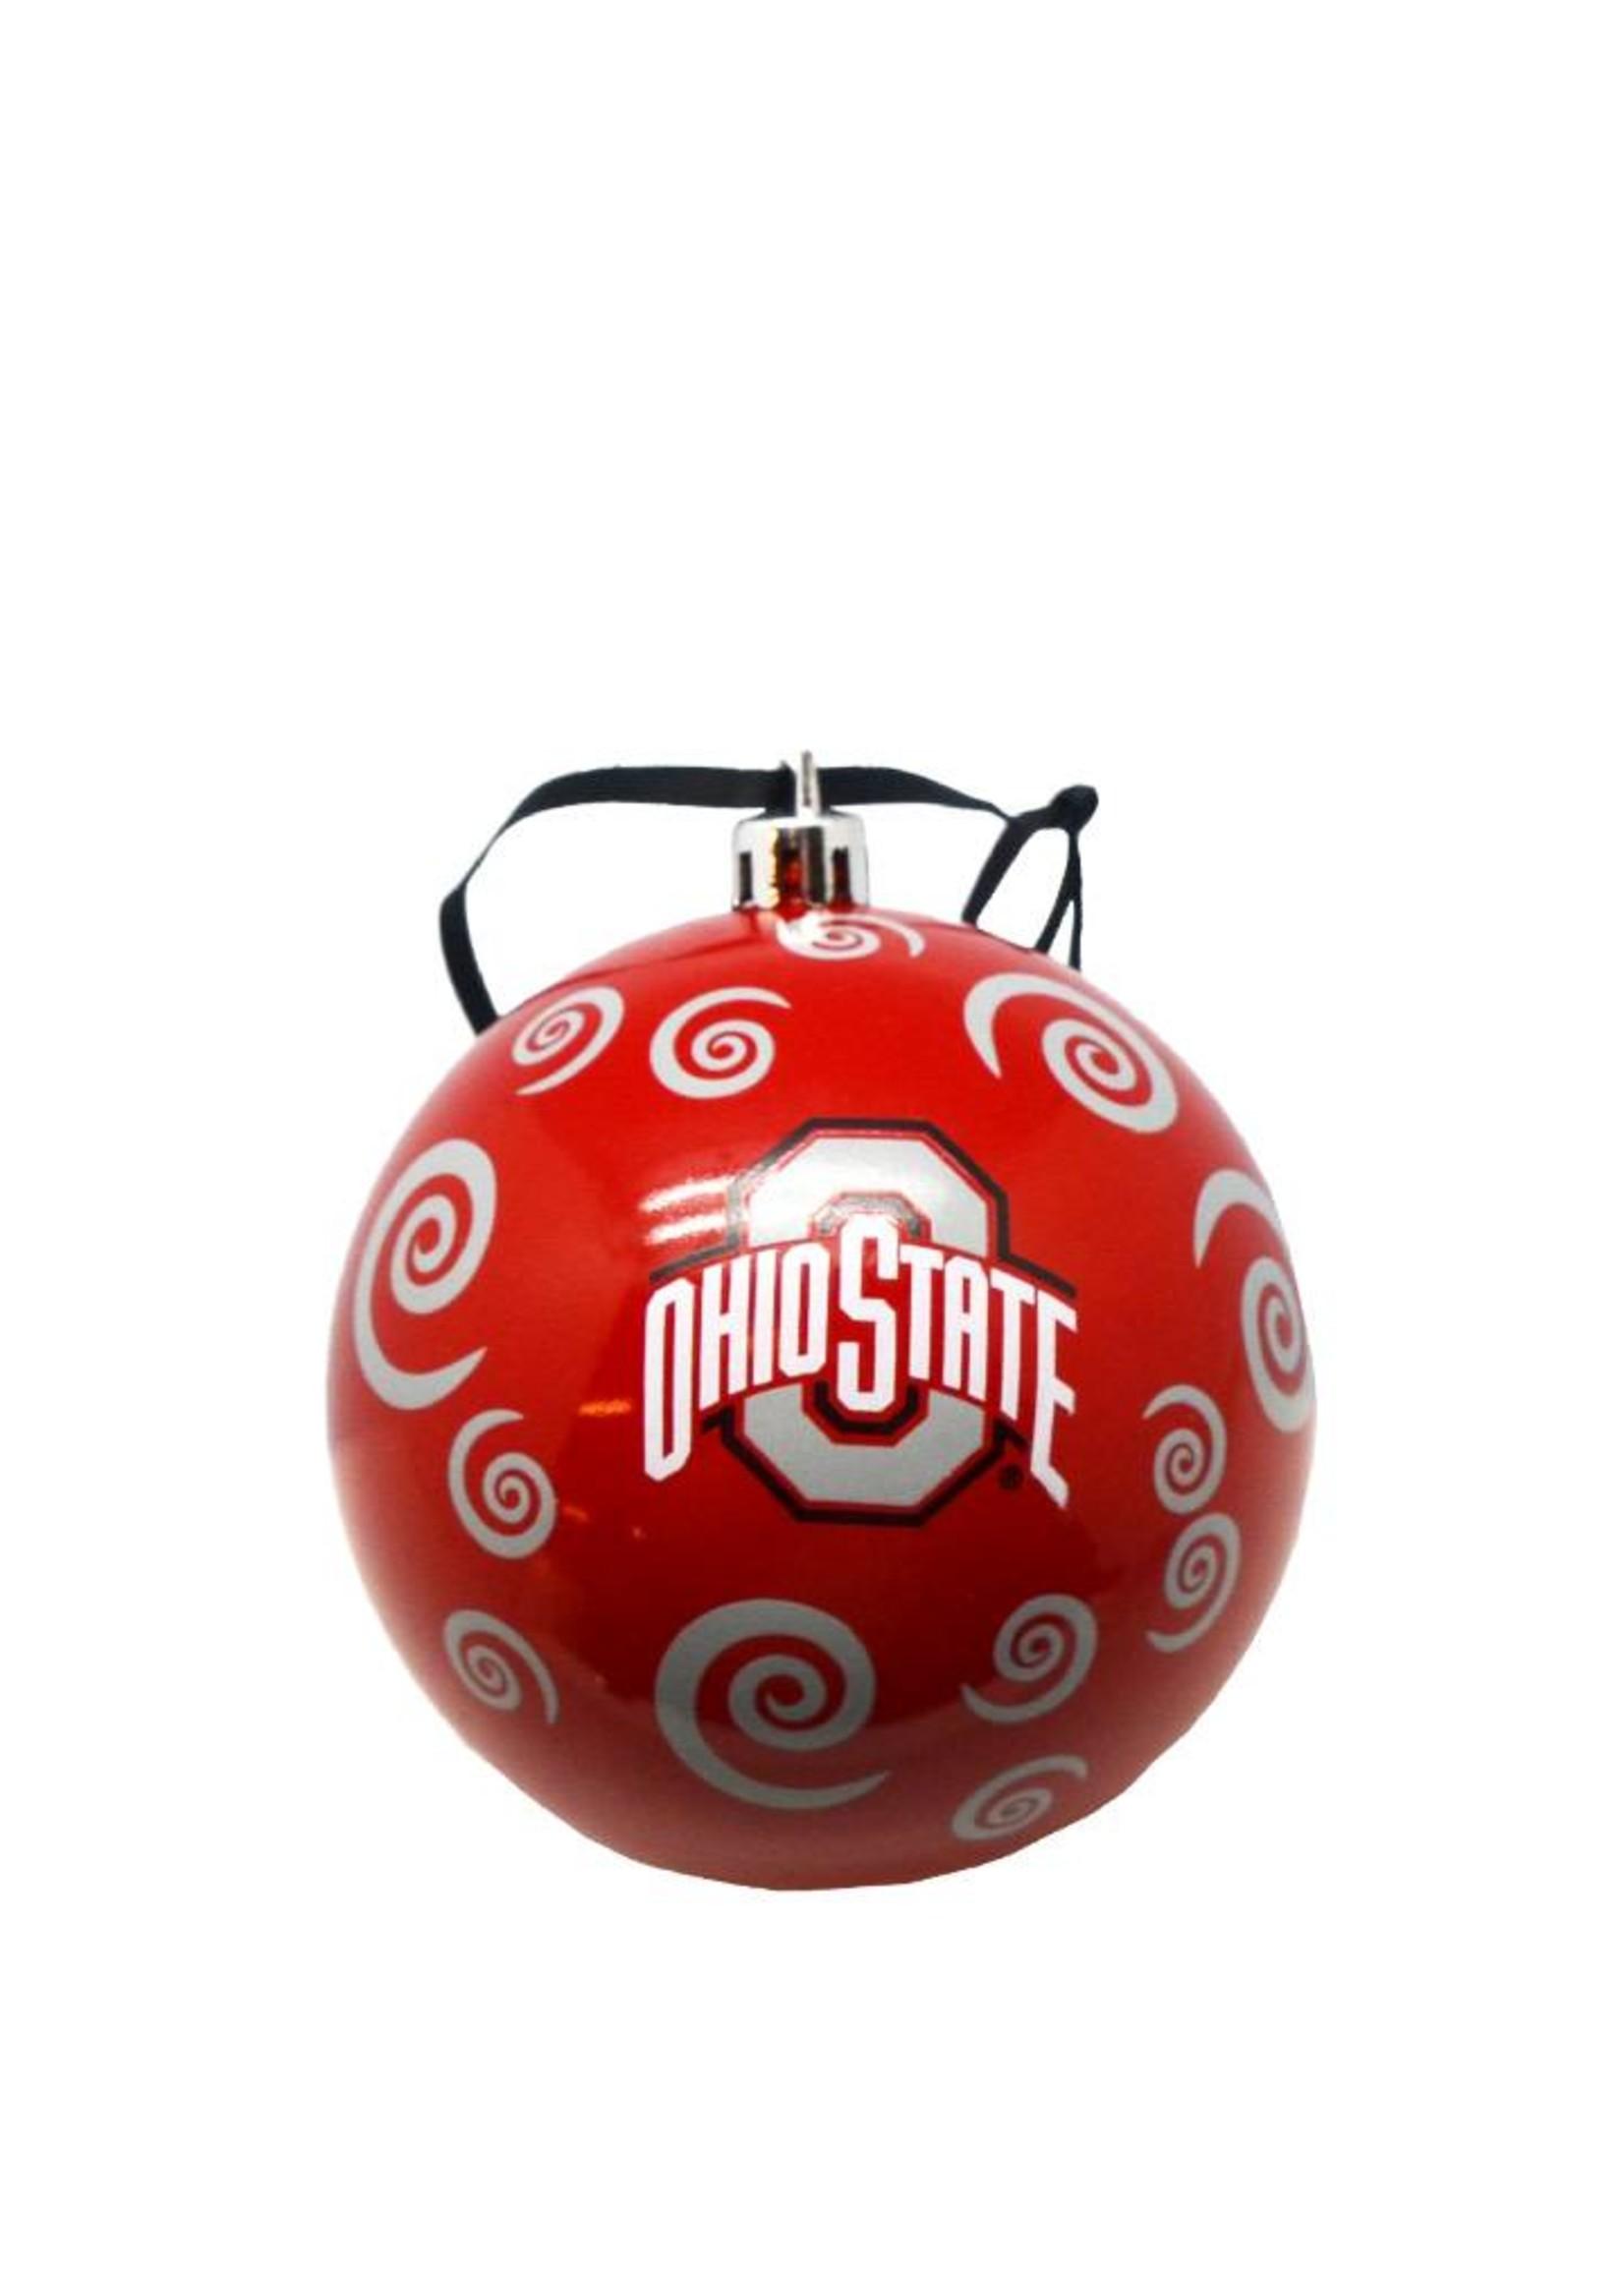 Ohio State Buckeyes Team Swirl Ball Ornament